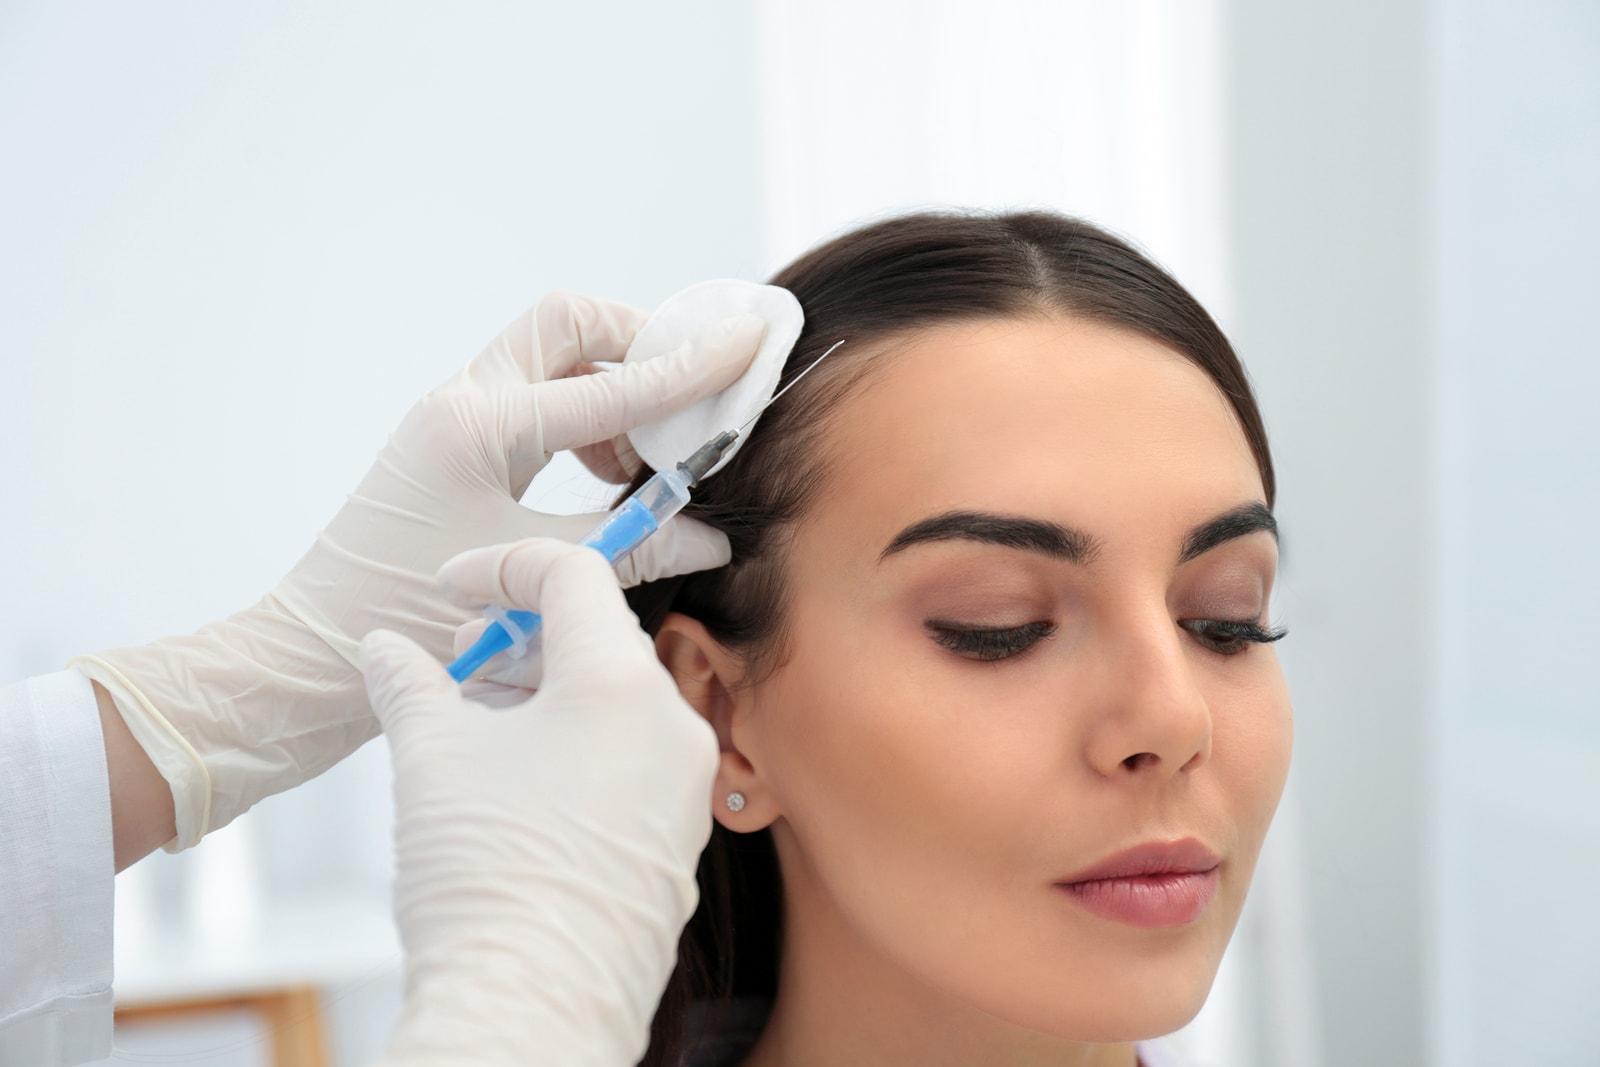 Haarimplantation Frauen